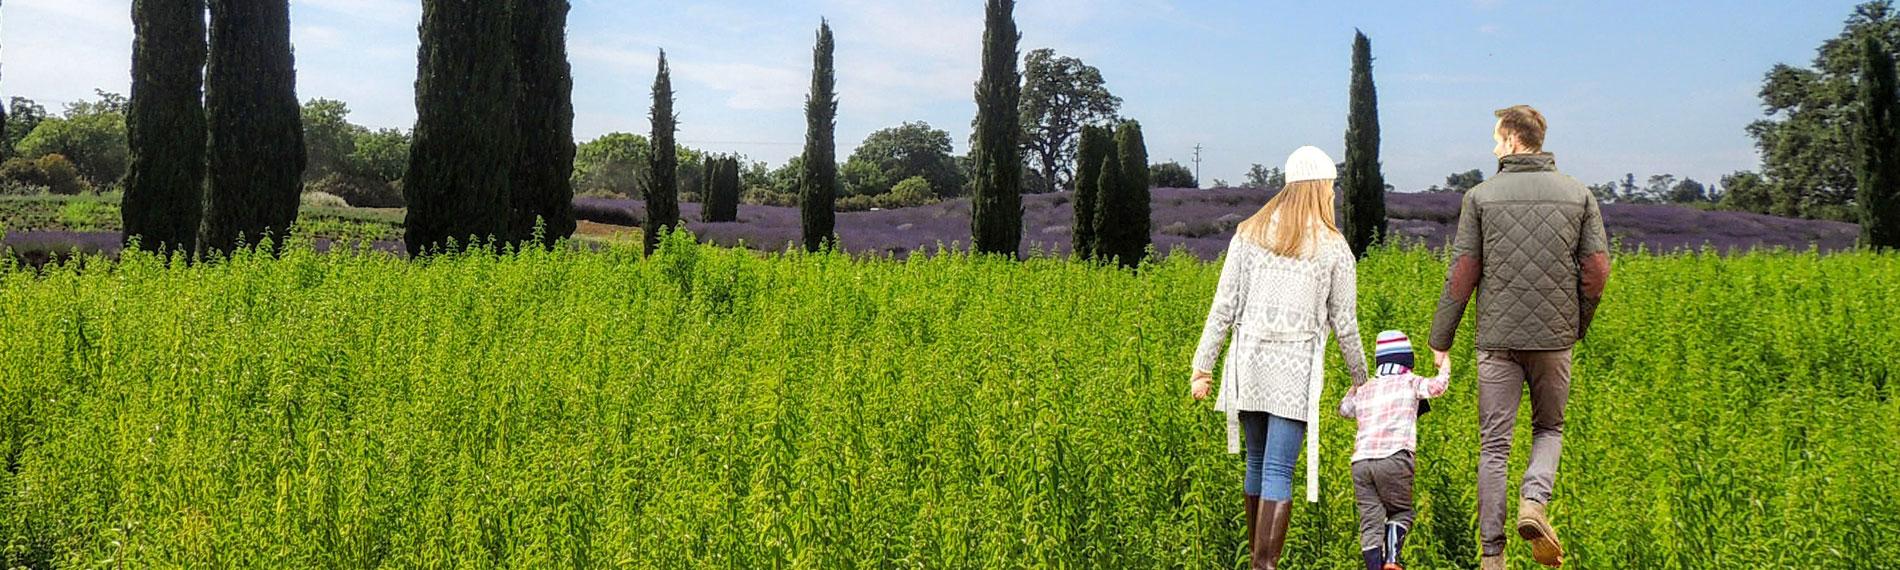 Tour The Lavender Fields